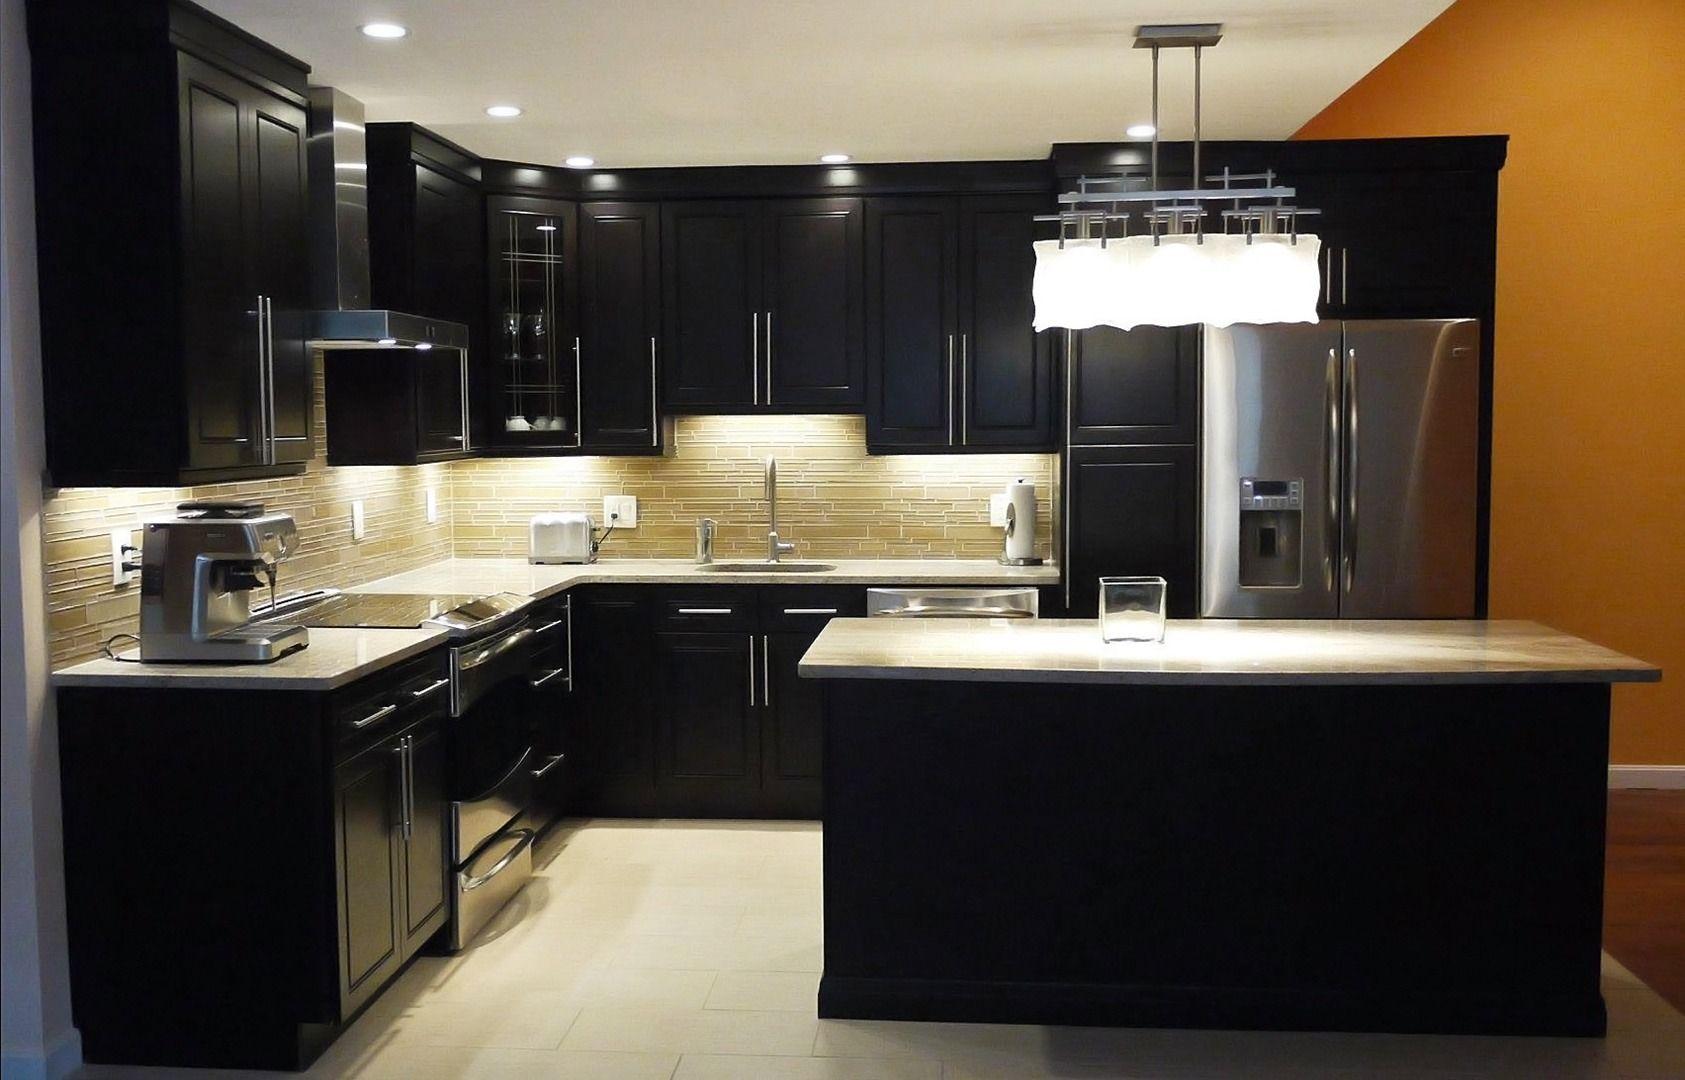 httpkitchencabinetandstonecomsollid cabinetry remodeling showroom scottsdale az kitchen cabinets pinterest. beautiful ideas. Home Design Ideas